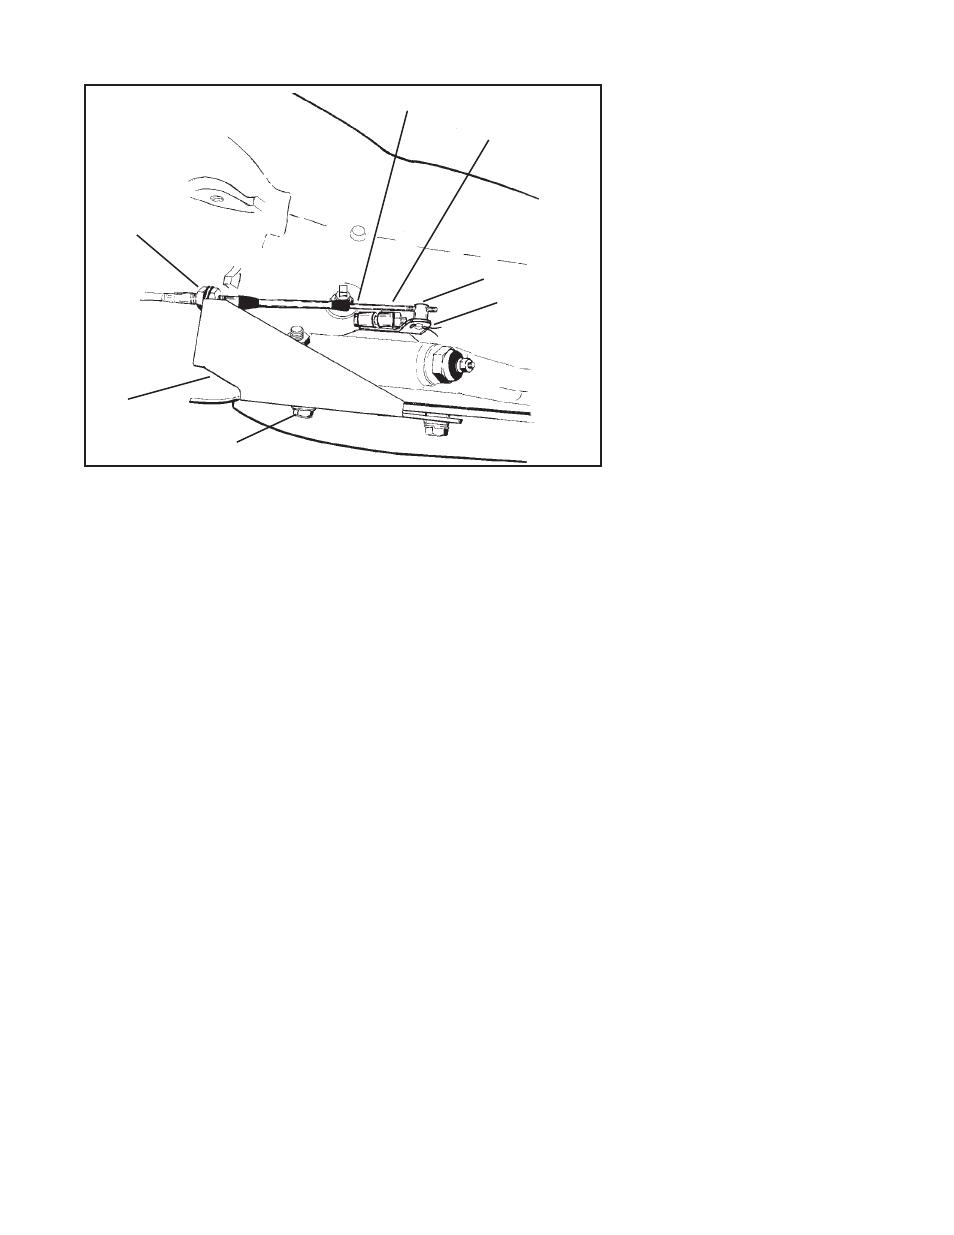 Ford Aod Neutral Safety Switch Wiring Diagram Interesting Ideas Transmission